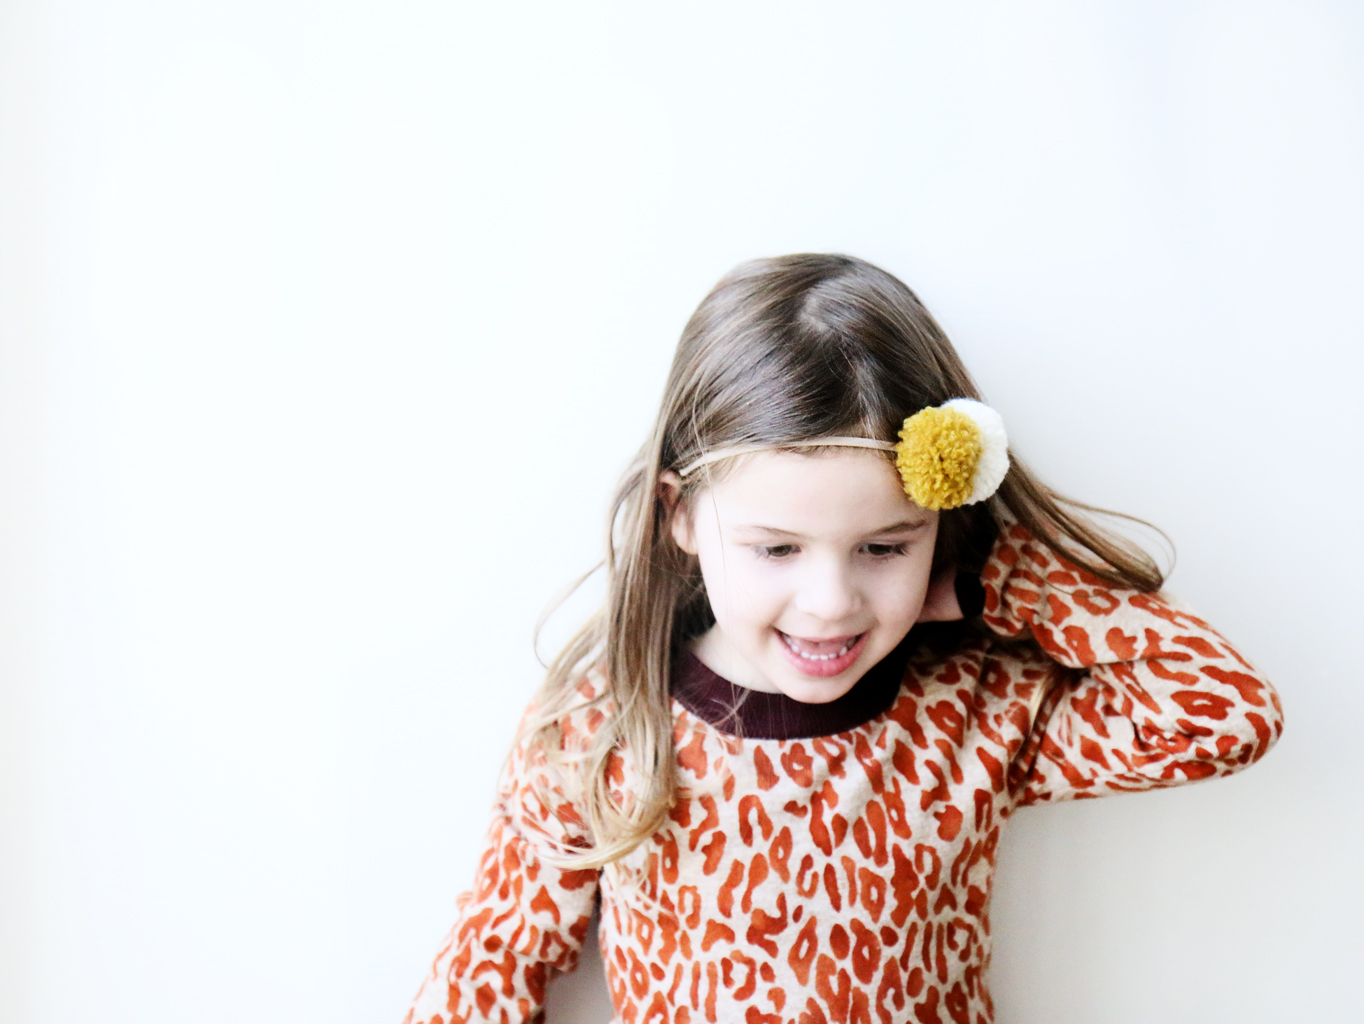 img_1010-minibelle-nl trendy outfit herfst kleuren en wol scotch r'belle meas babygoodies collegien naturino